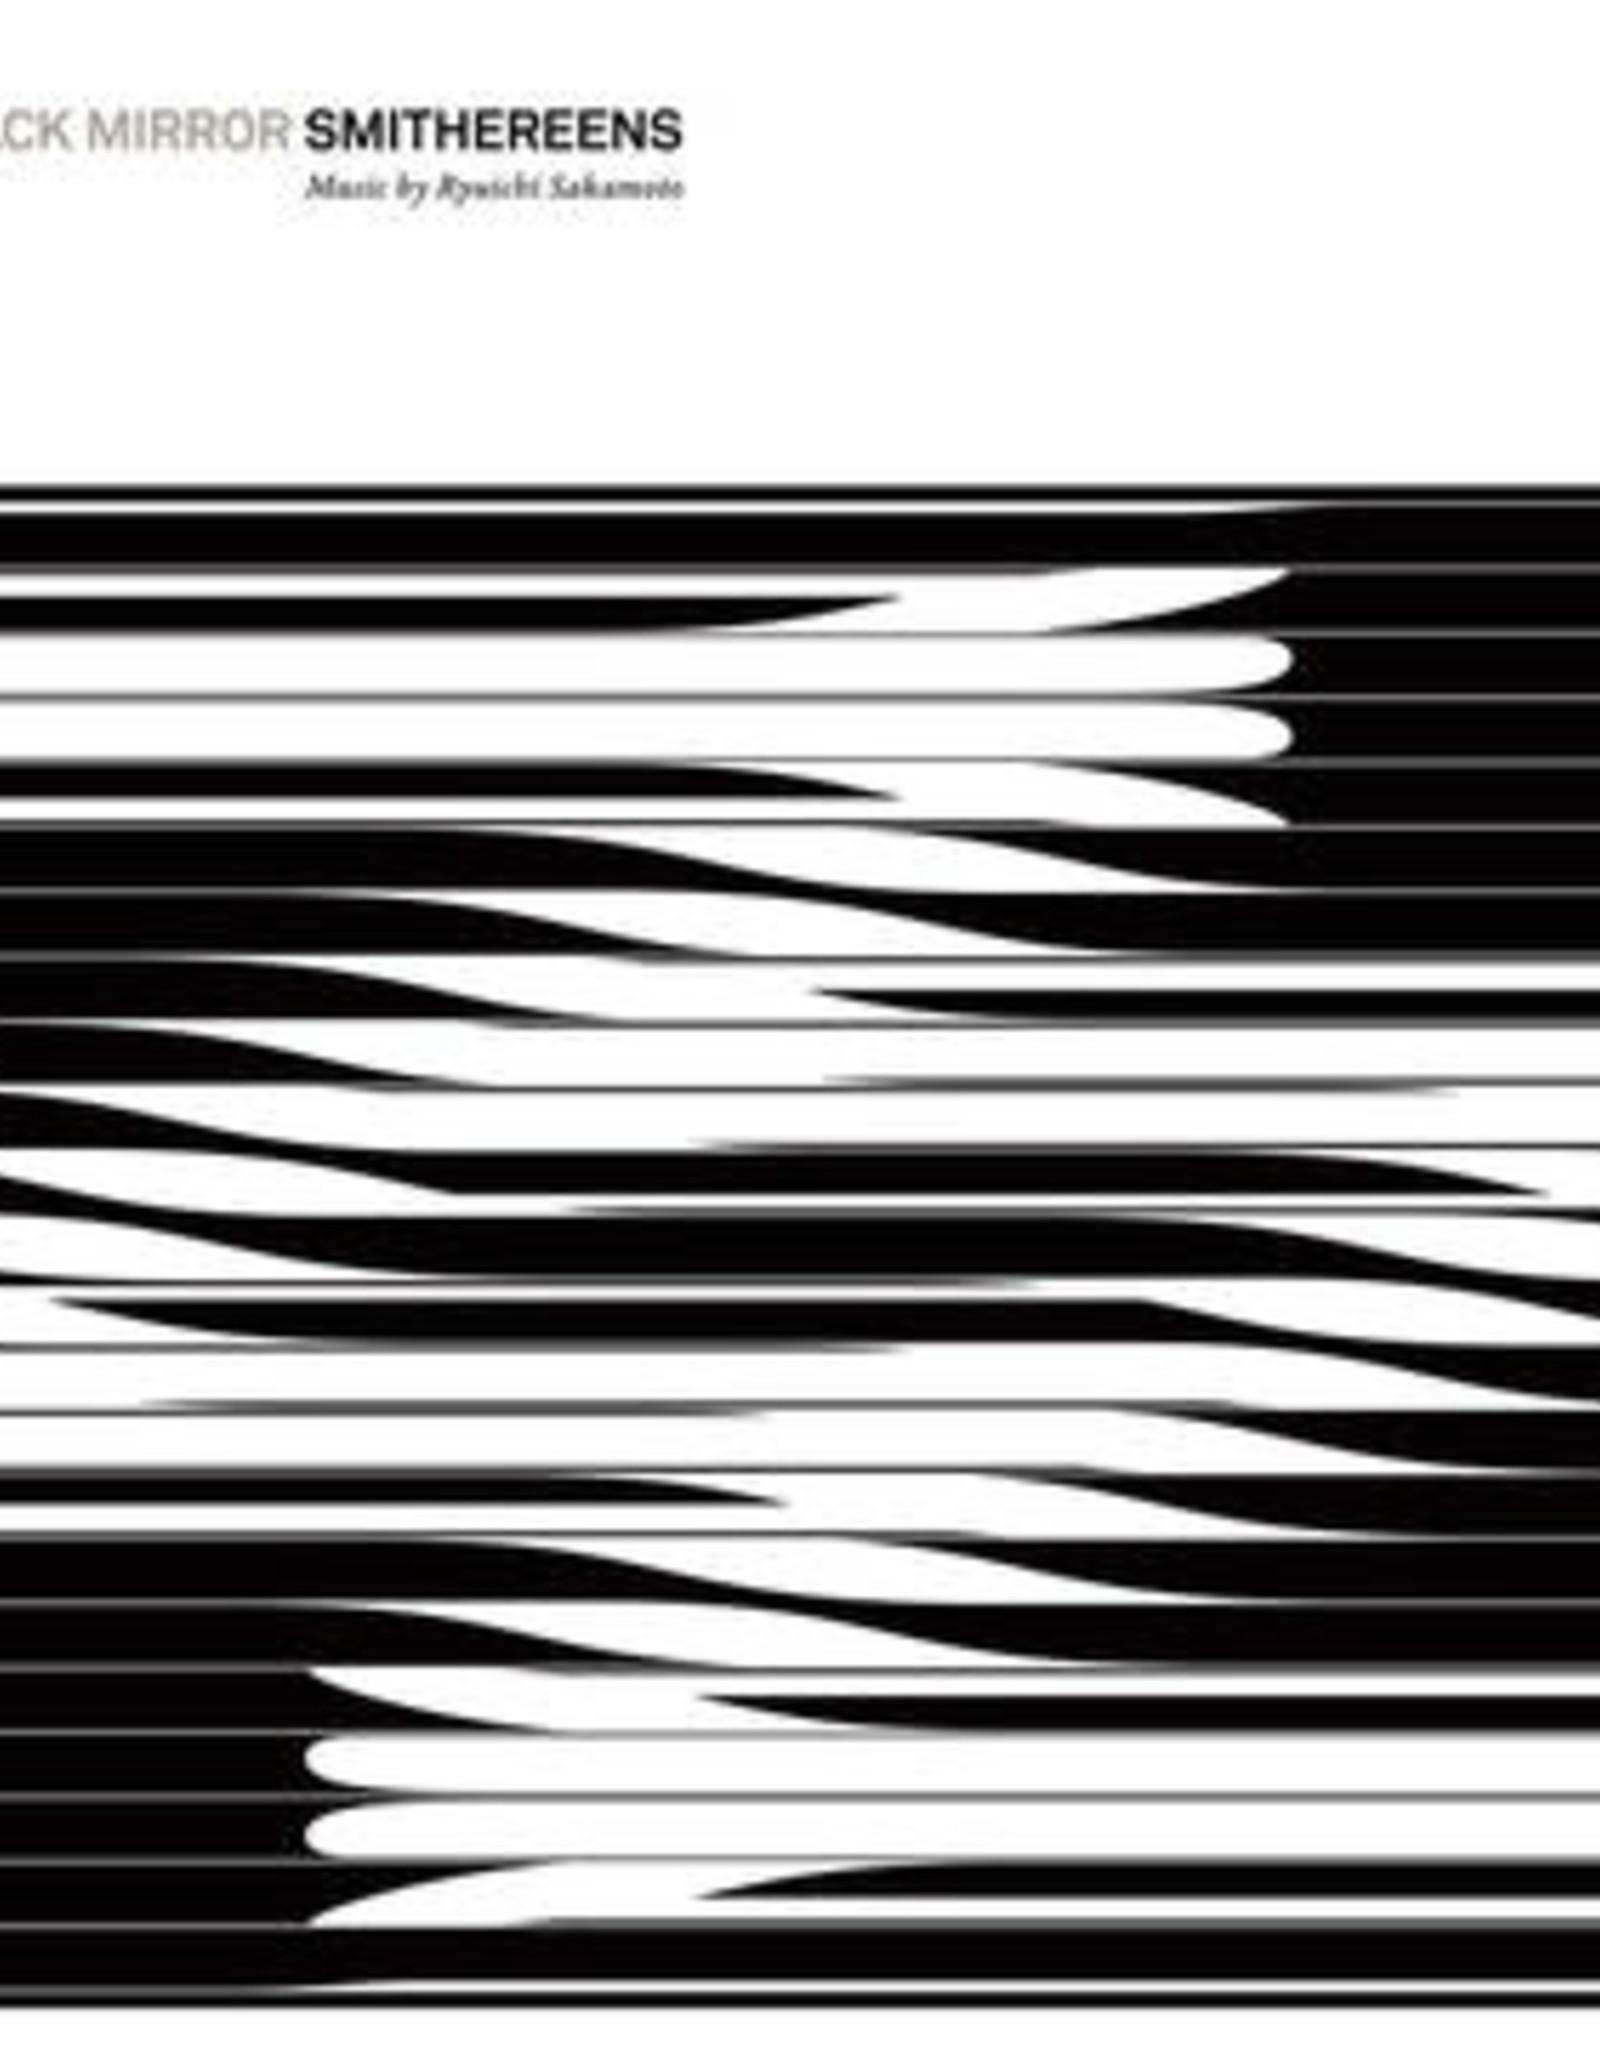 Ryuichi Sakamoto - Black Mirror: Smithereens Ost  (RSD 2020)